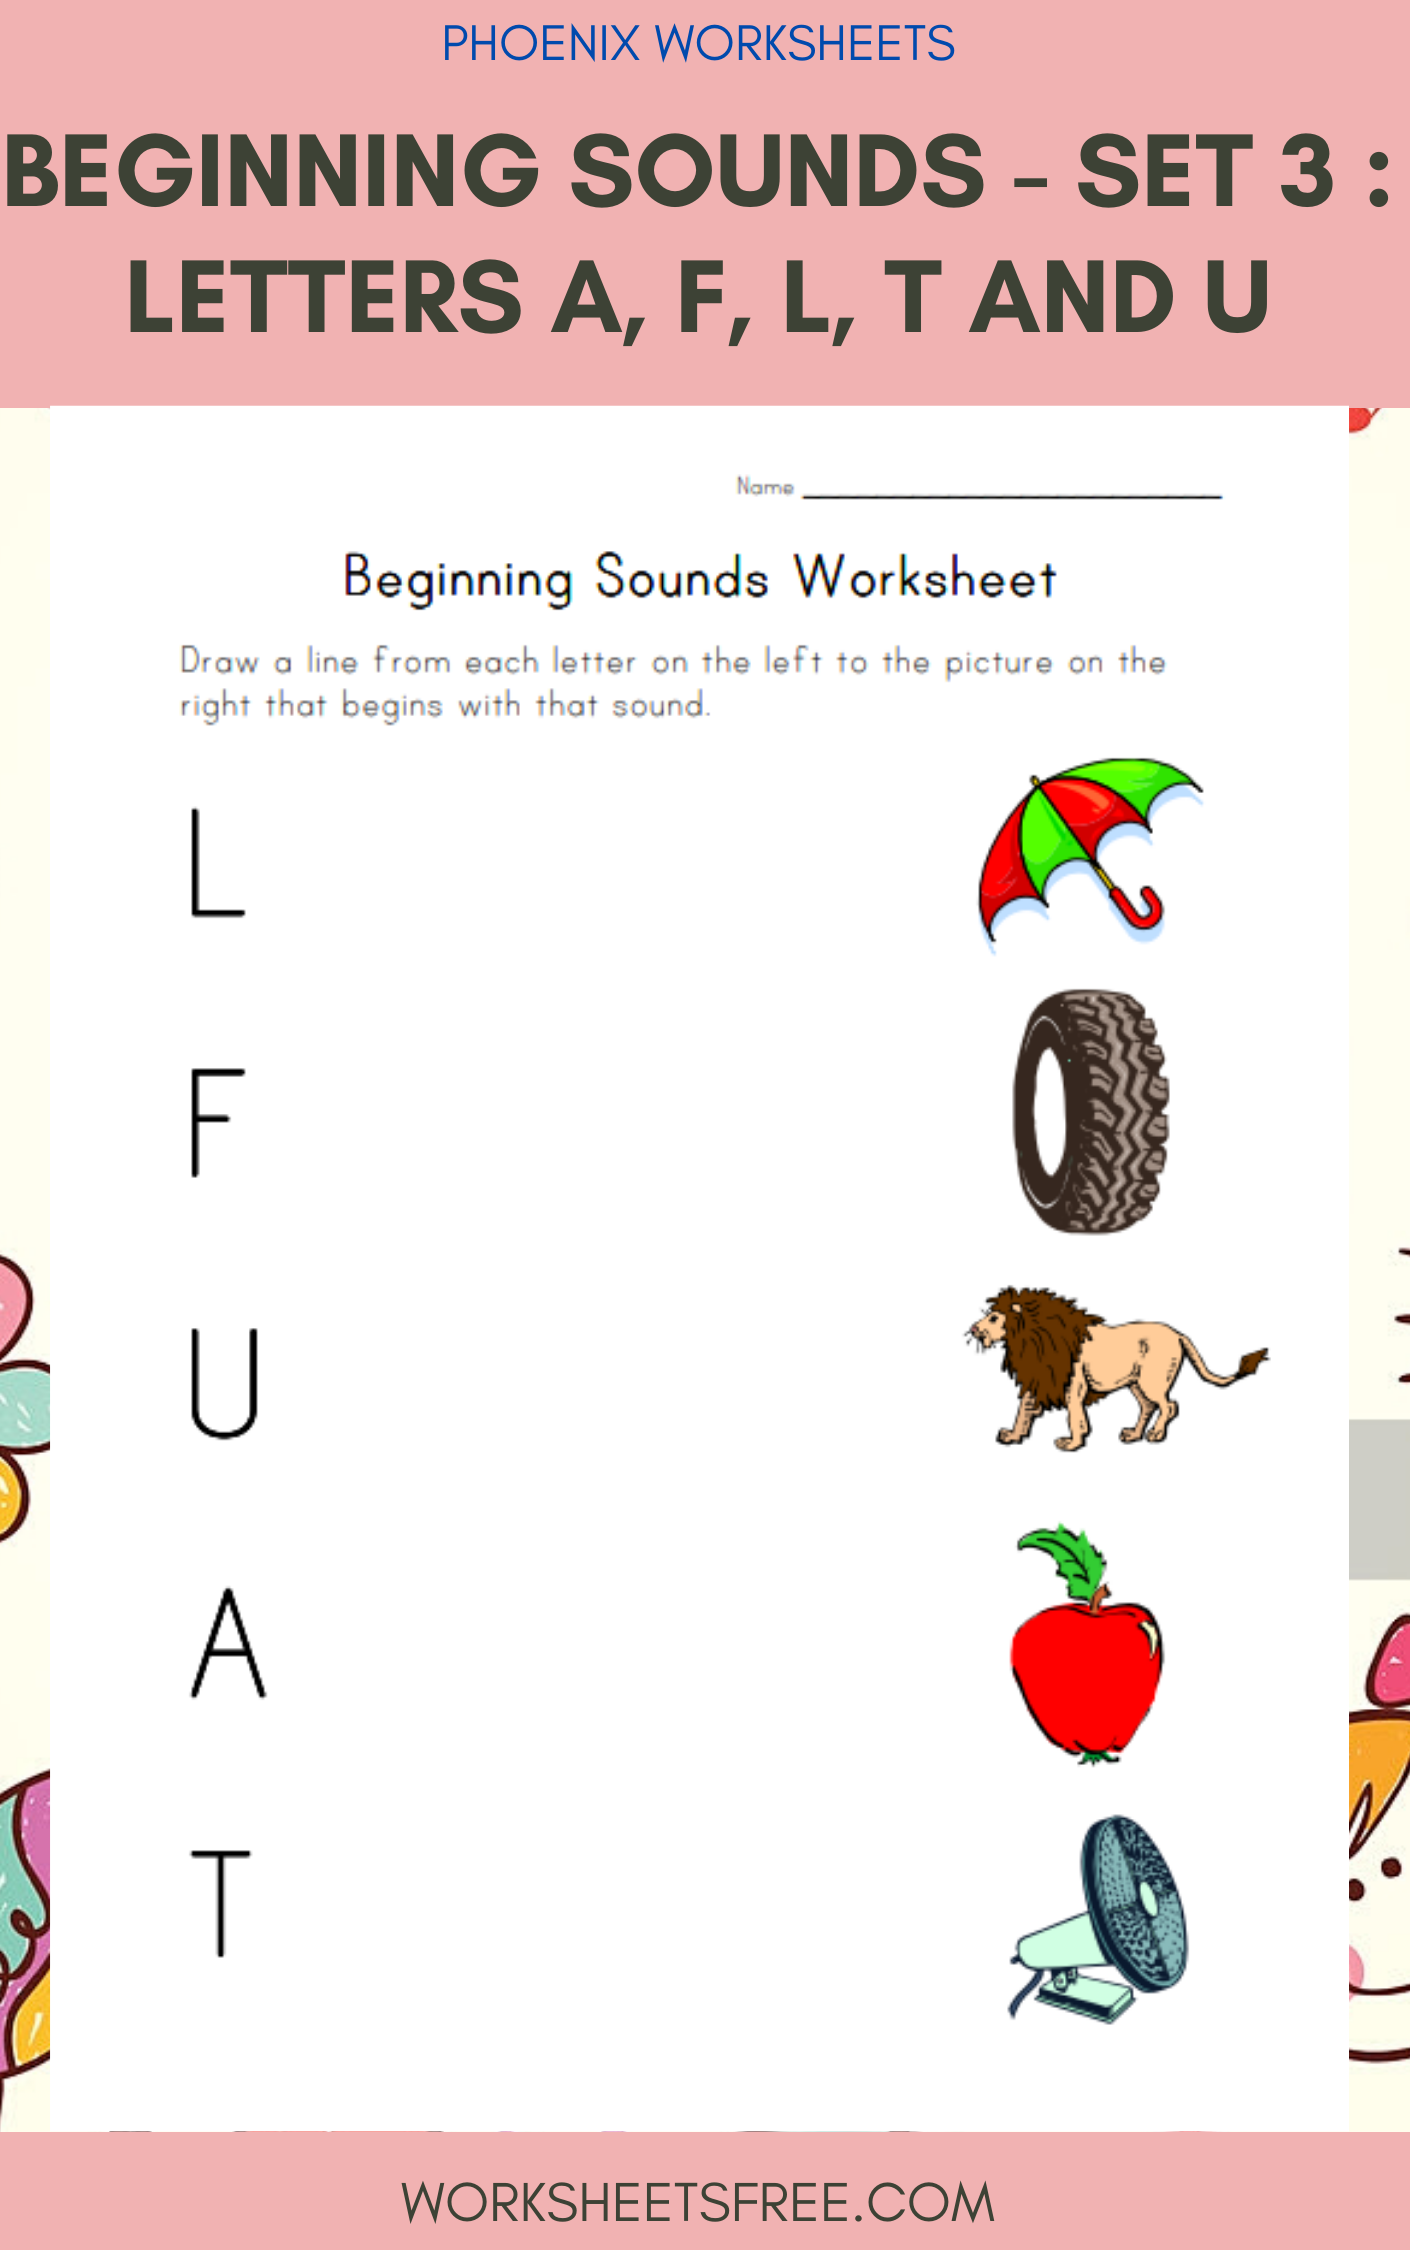 7 Beginning Sounds Worksheets In